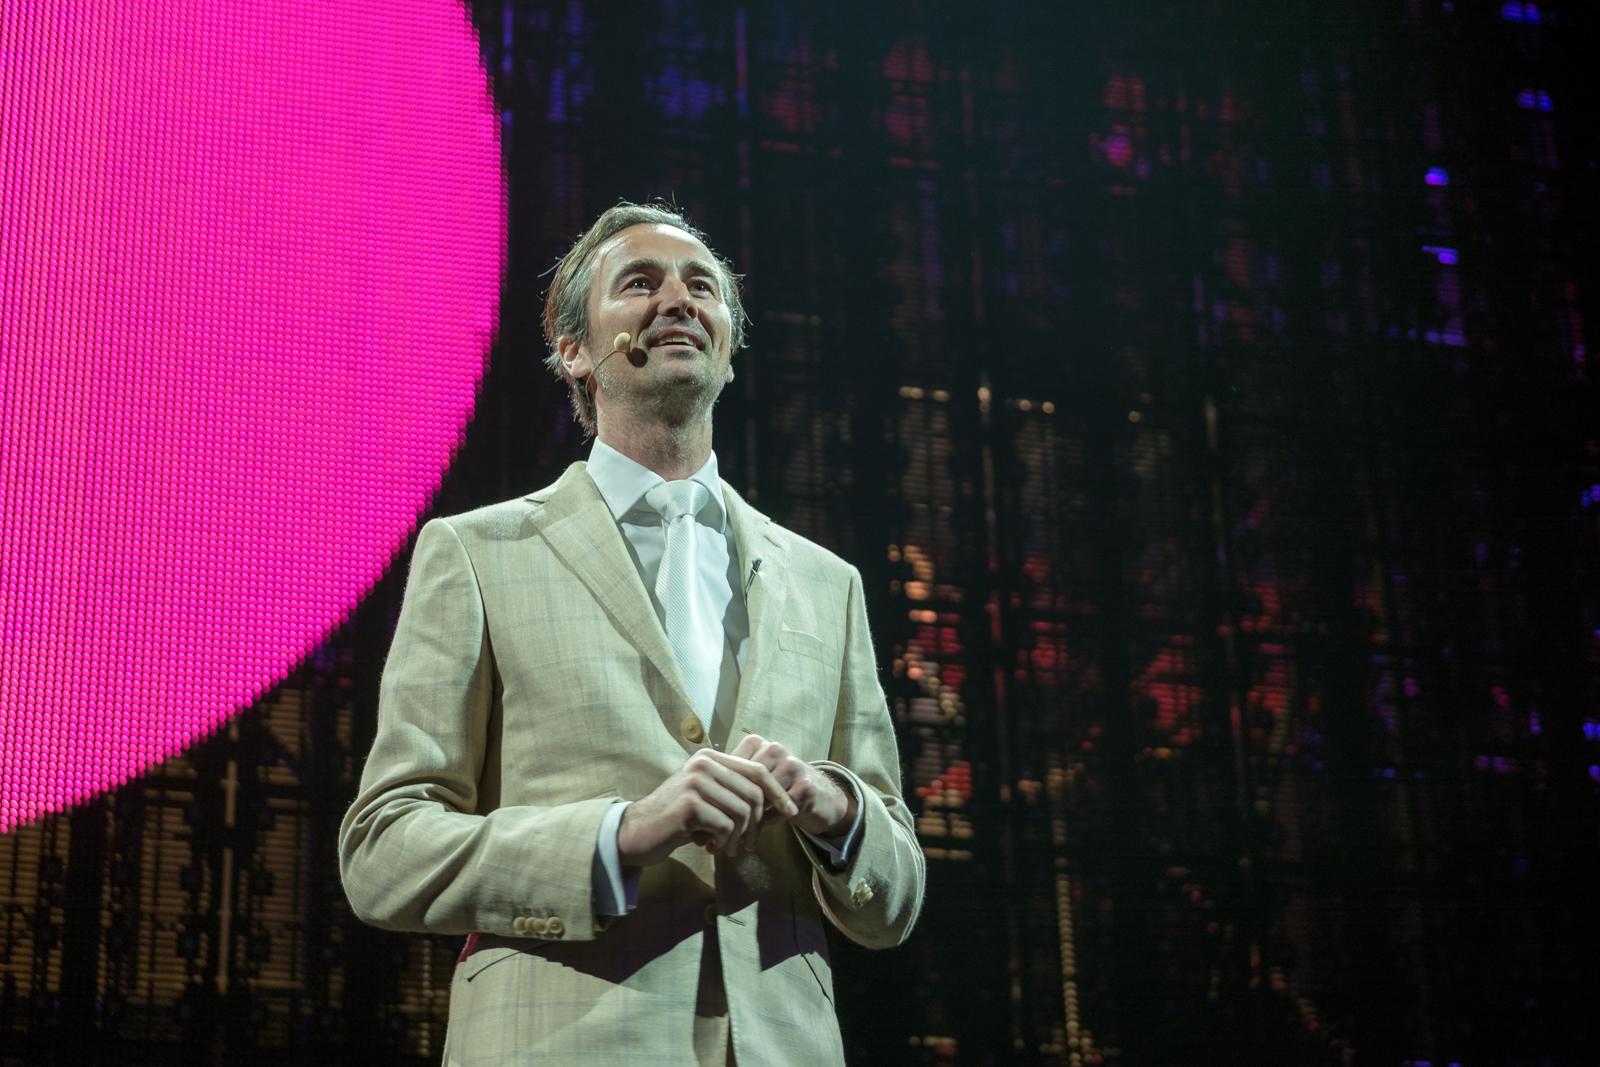 Boris Veldhuijzen van Zanten, CEO The Next Web při úvodní řeči